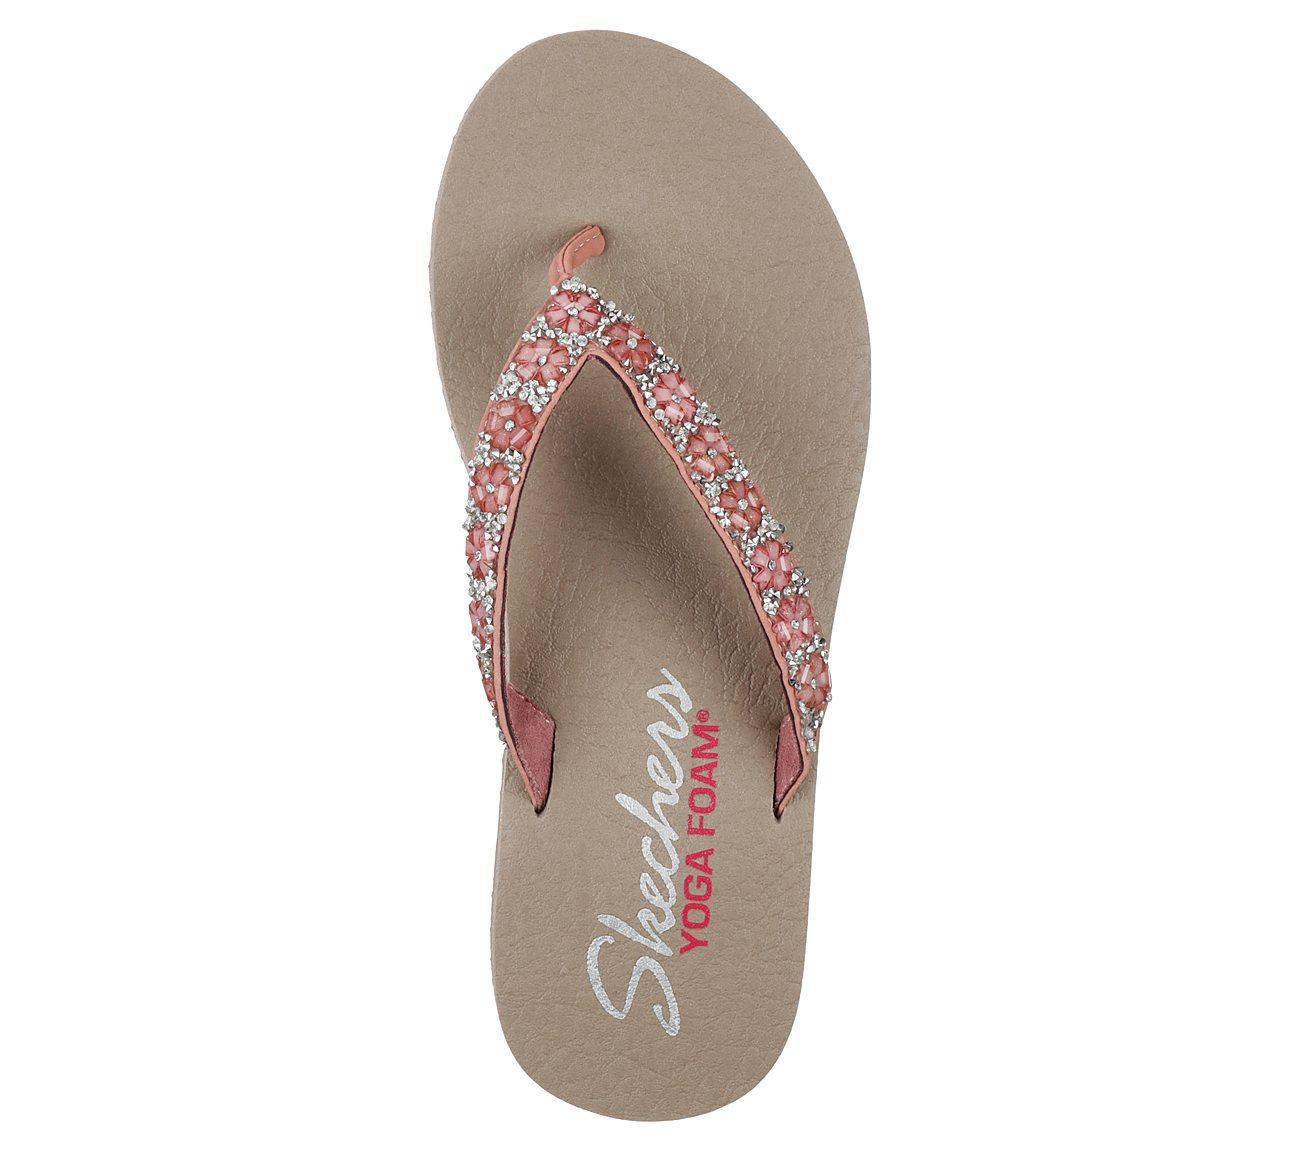 0cde445aa94b Buy SKECHERS Meditation - Daisy Delight SKECHERS Cali Shoes only £29.00